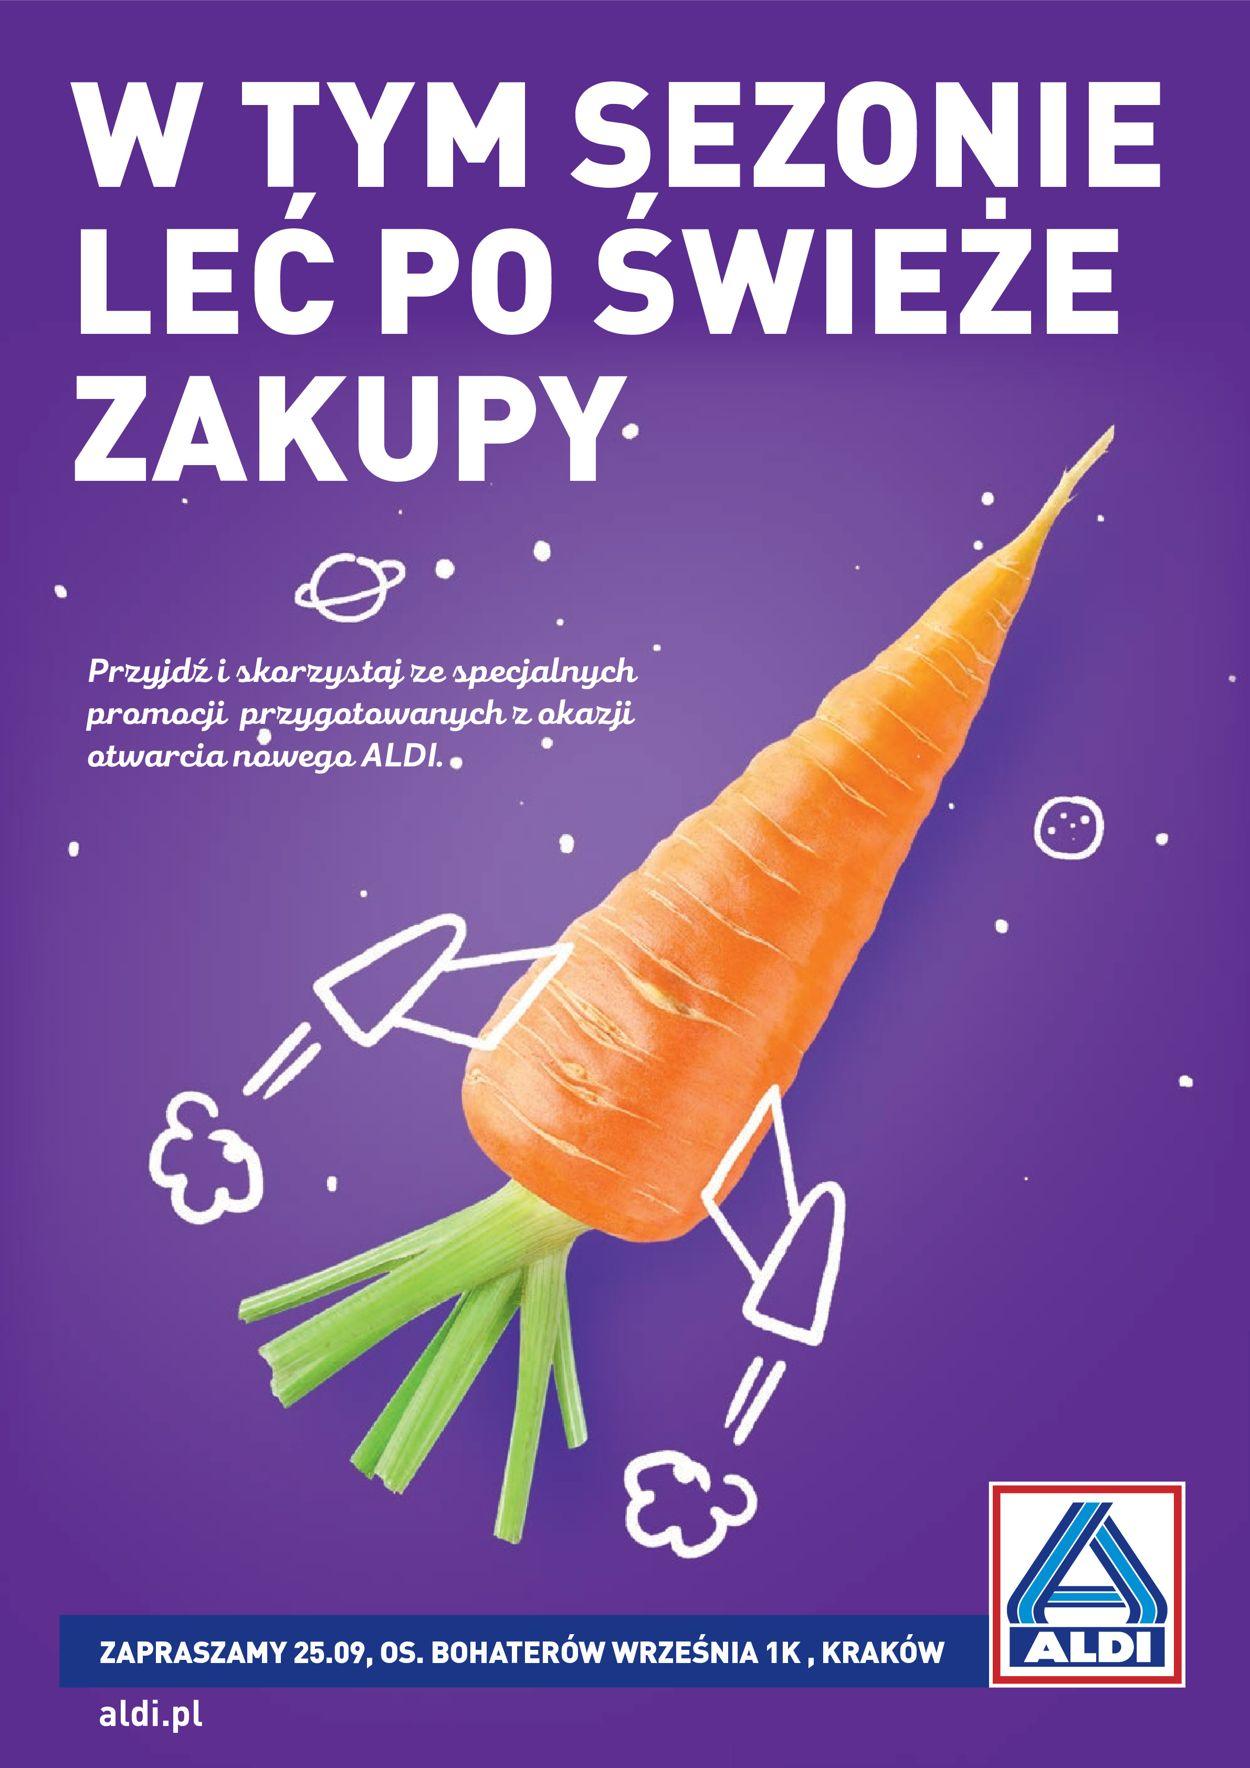 Gazetka promocyjna ALDI - 25.09-05.10.2019